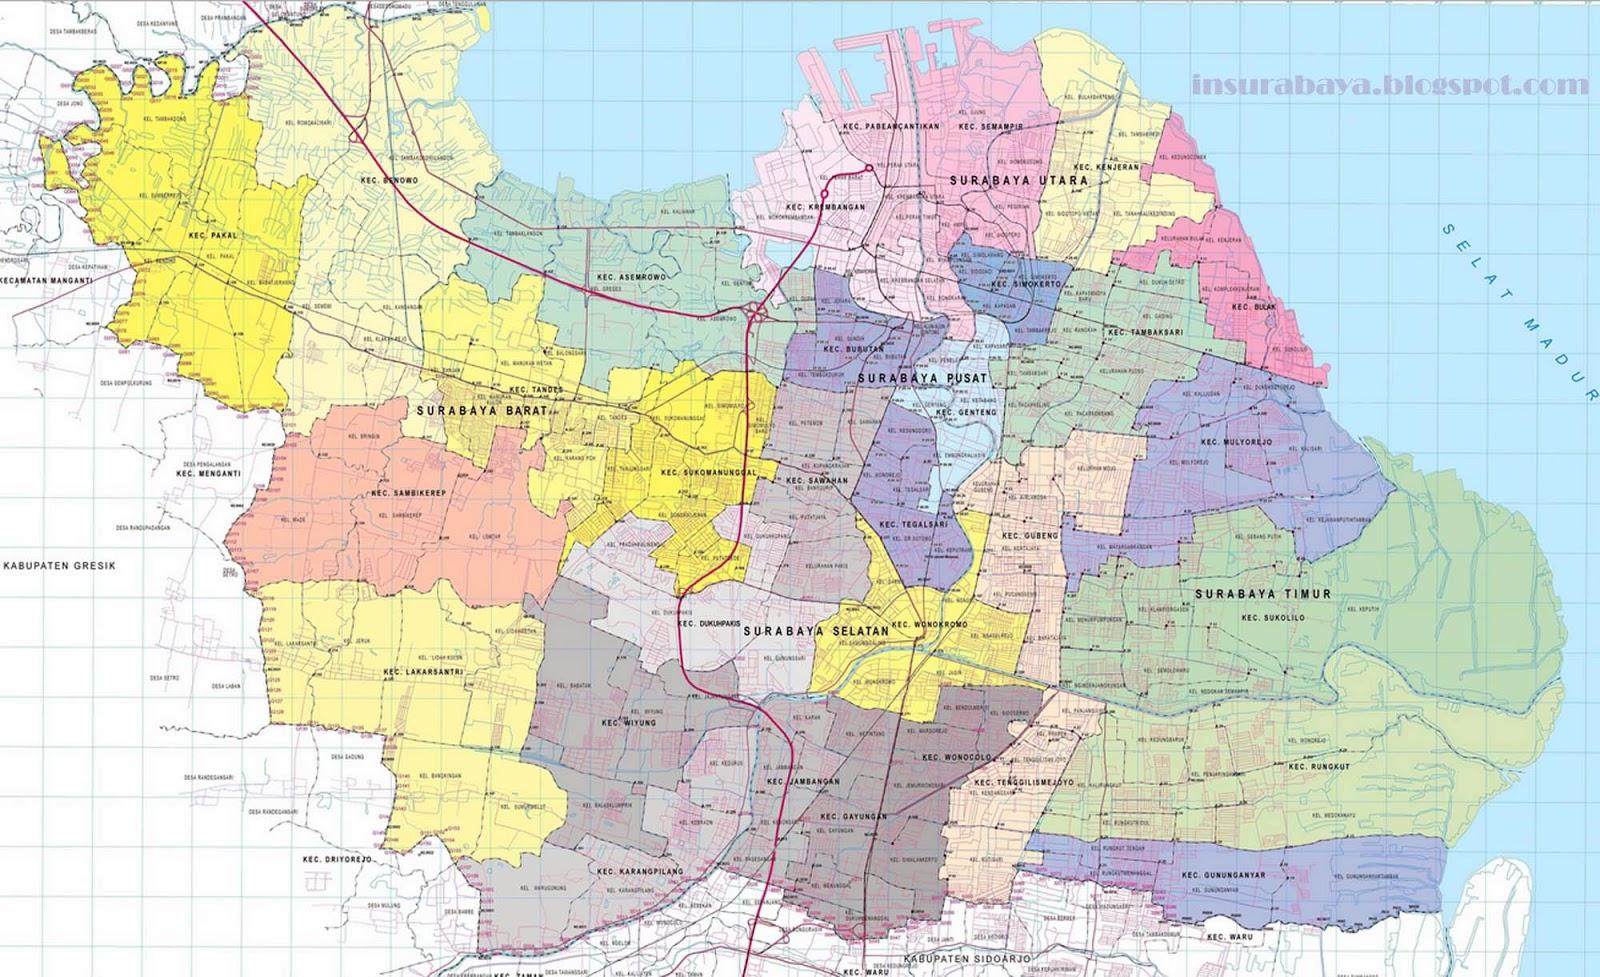 Peta Topografi Surabaya